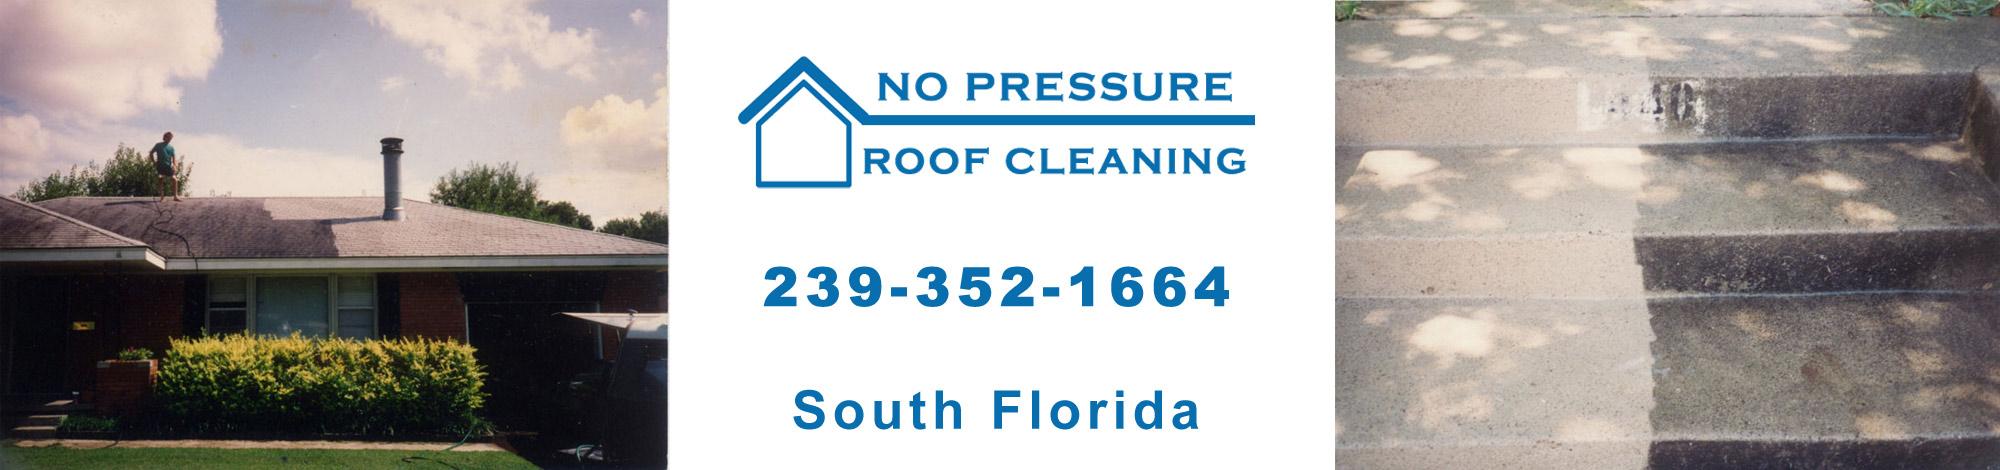 NoPressureRoofCleaning-Sout-Florida-banner